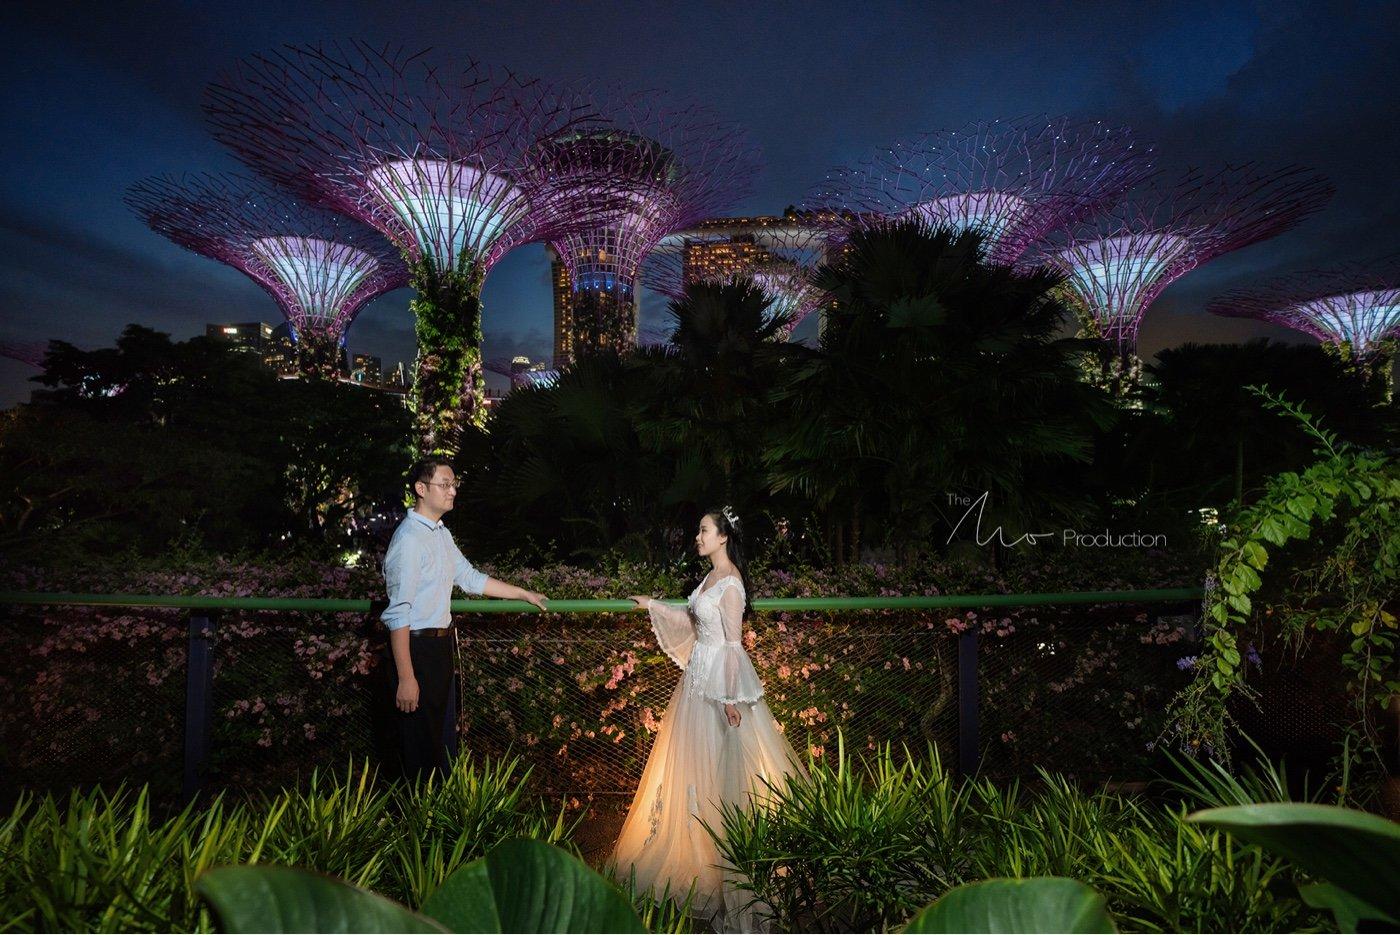 MoFoTo | 新加坡旅拍婚纱11